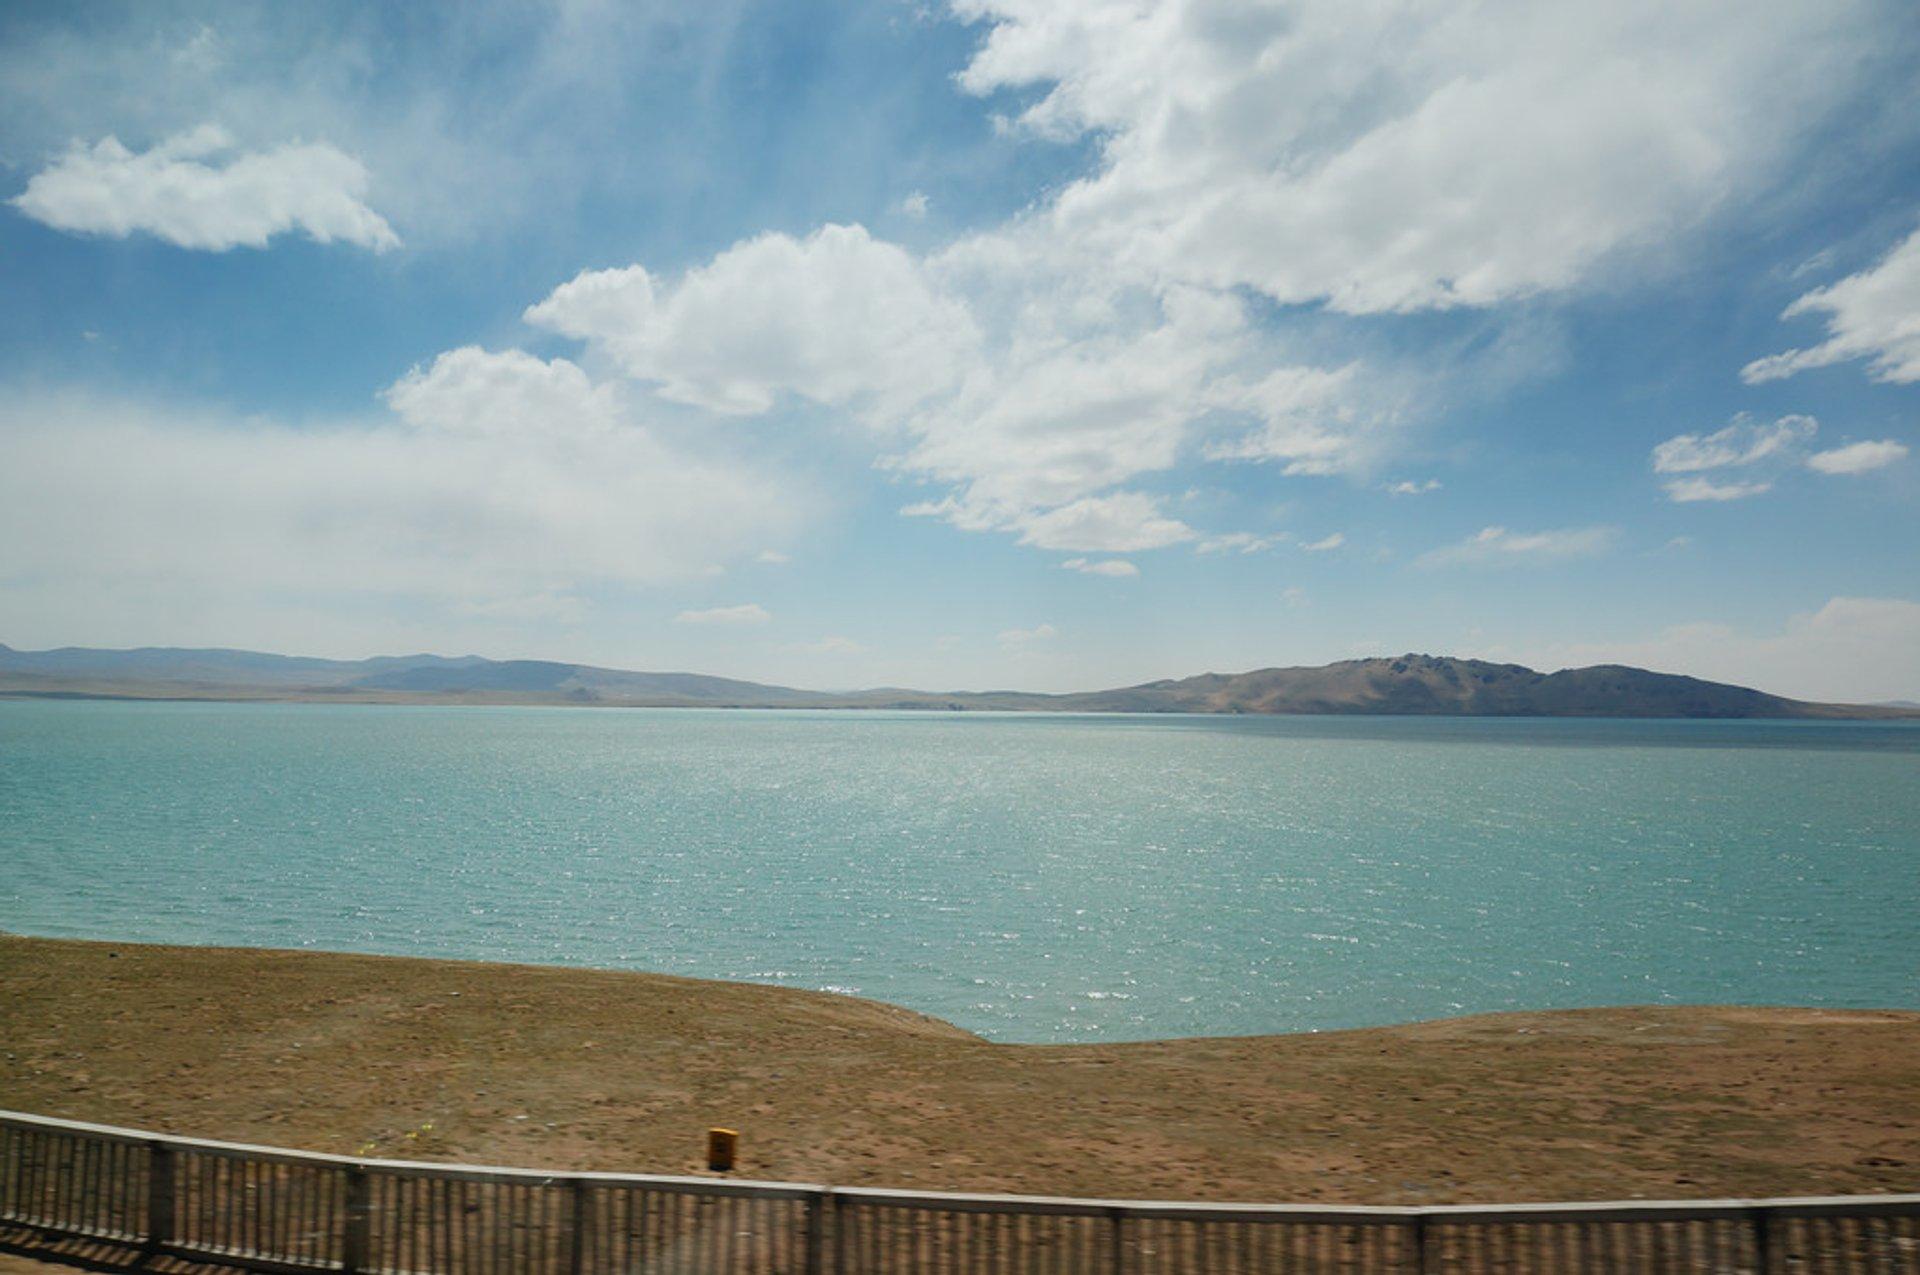 Qinghai-Tibet Railway View 2019